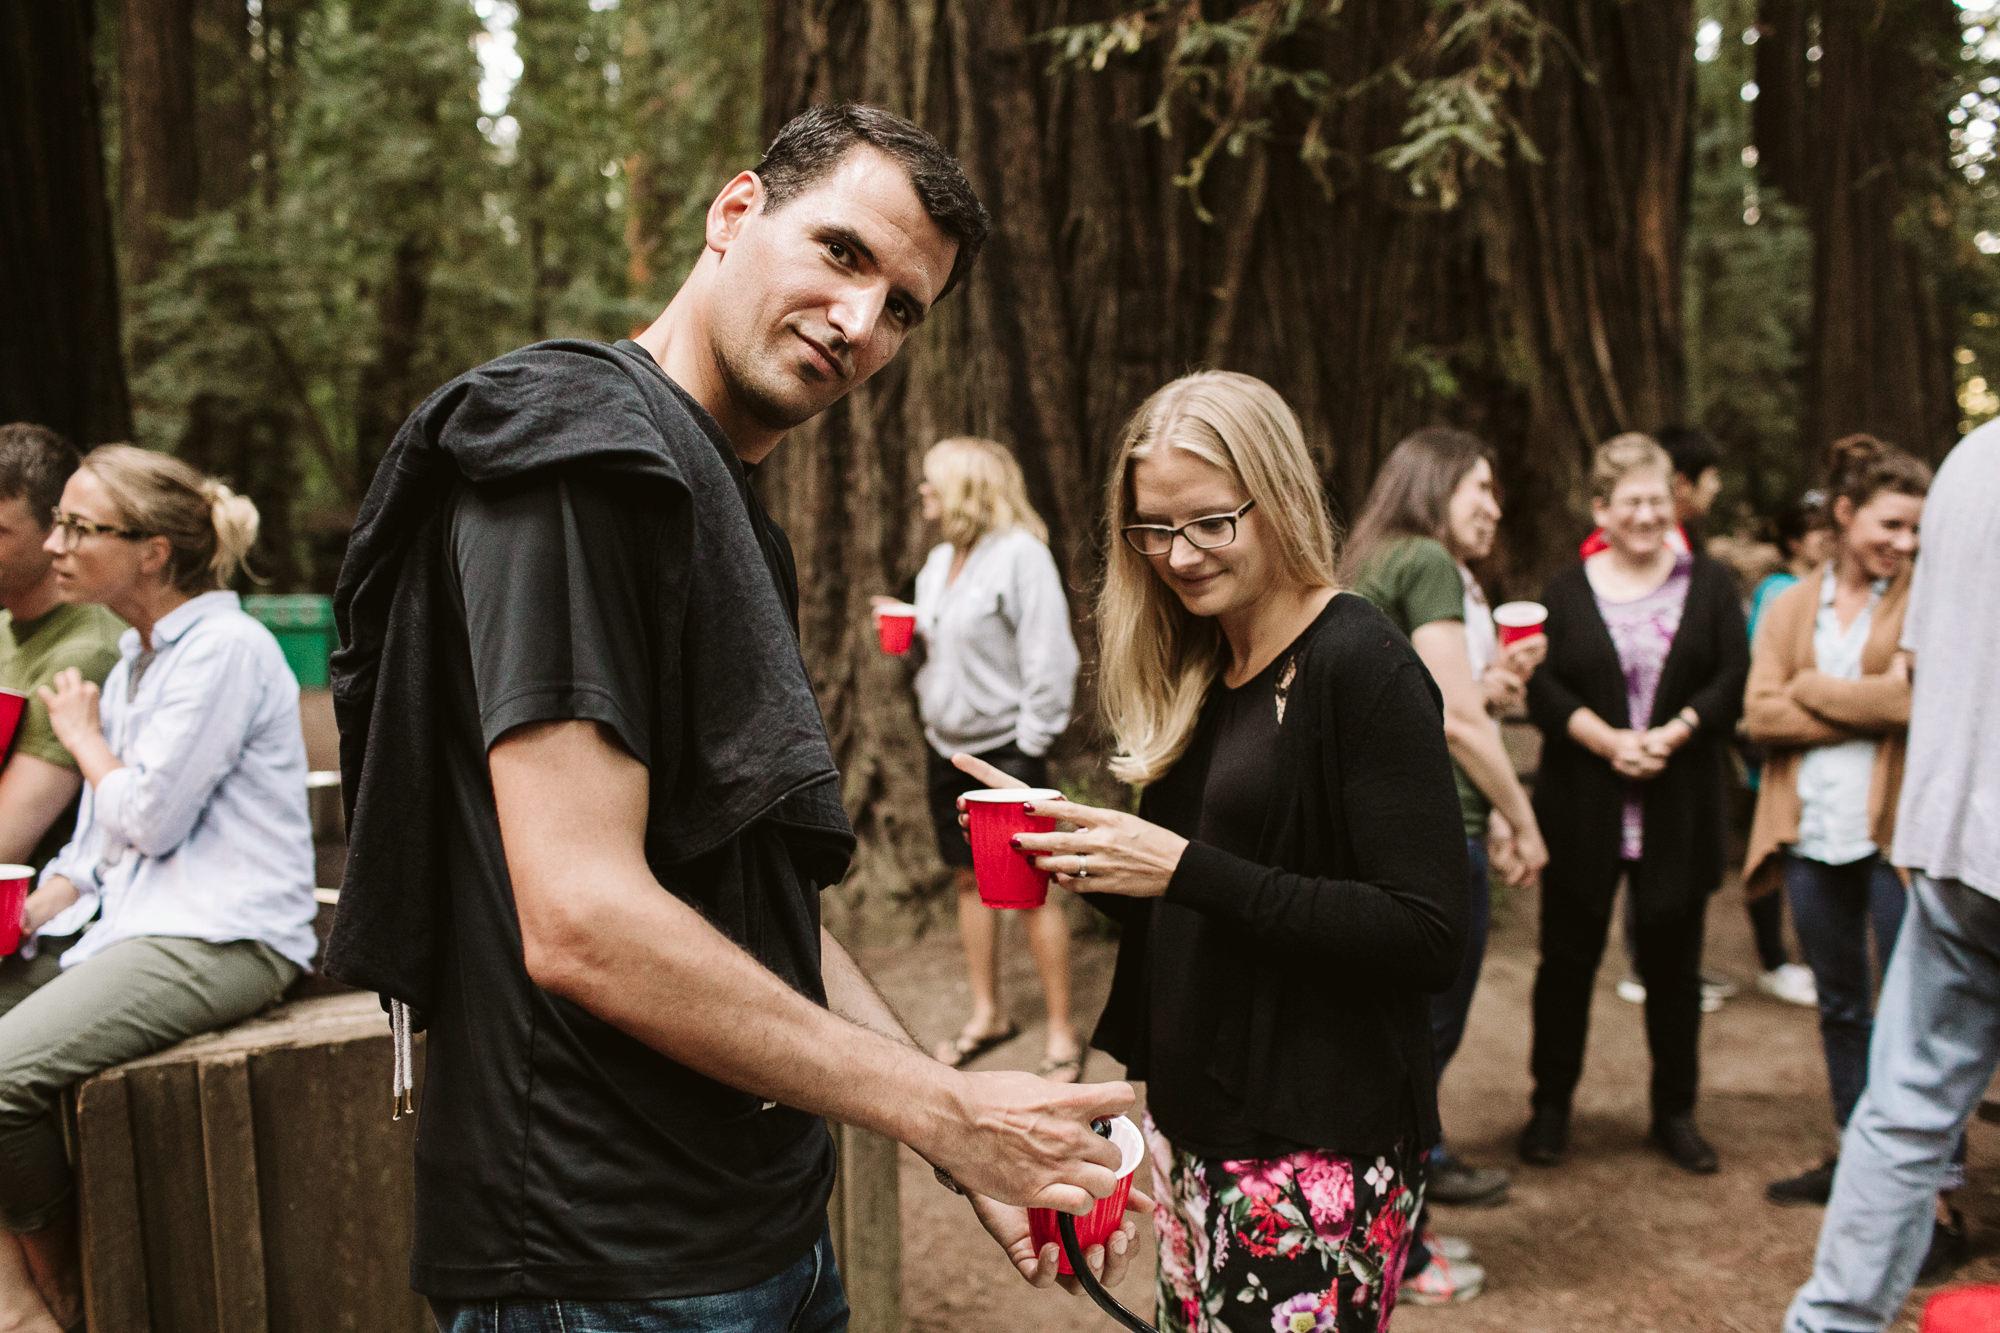 California-wedding-photographer-alfonso-flores-pamplin-groove-59.jpg